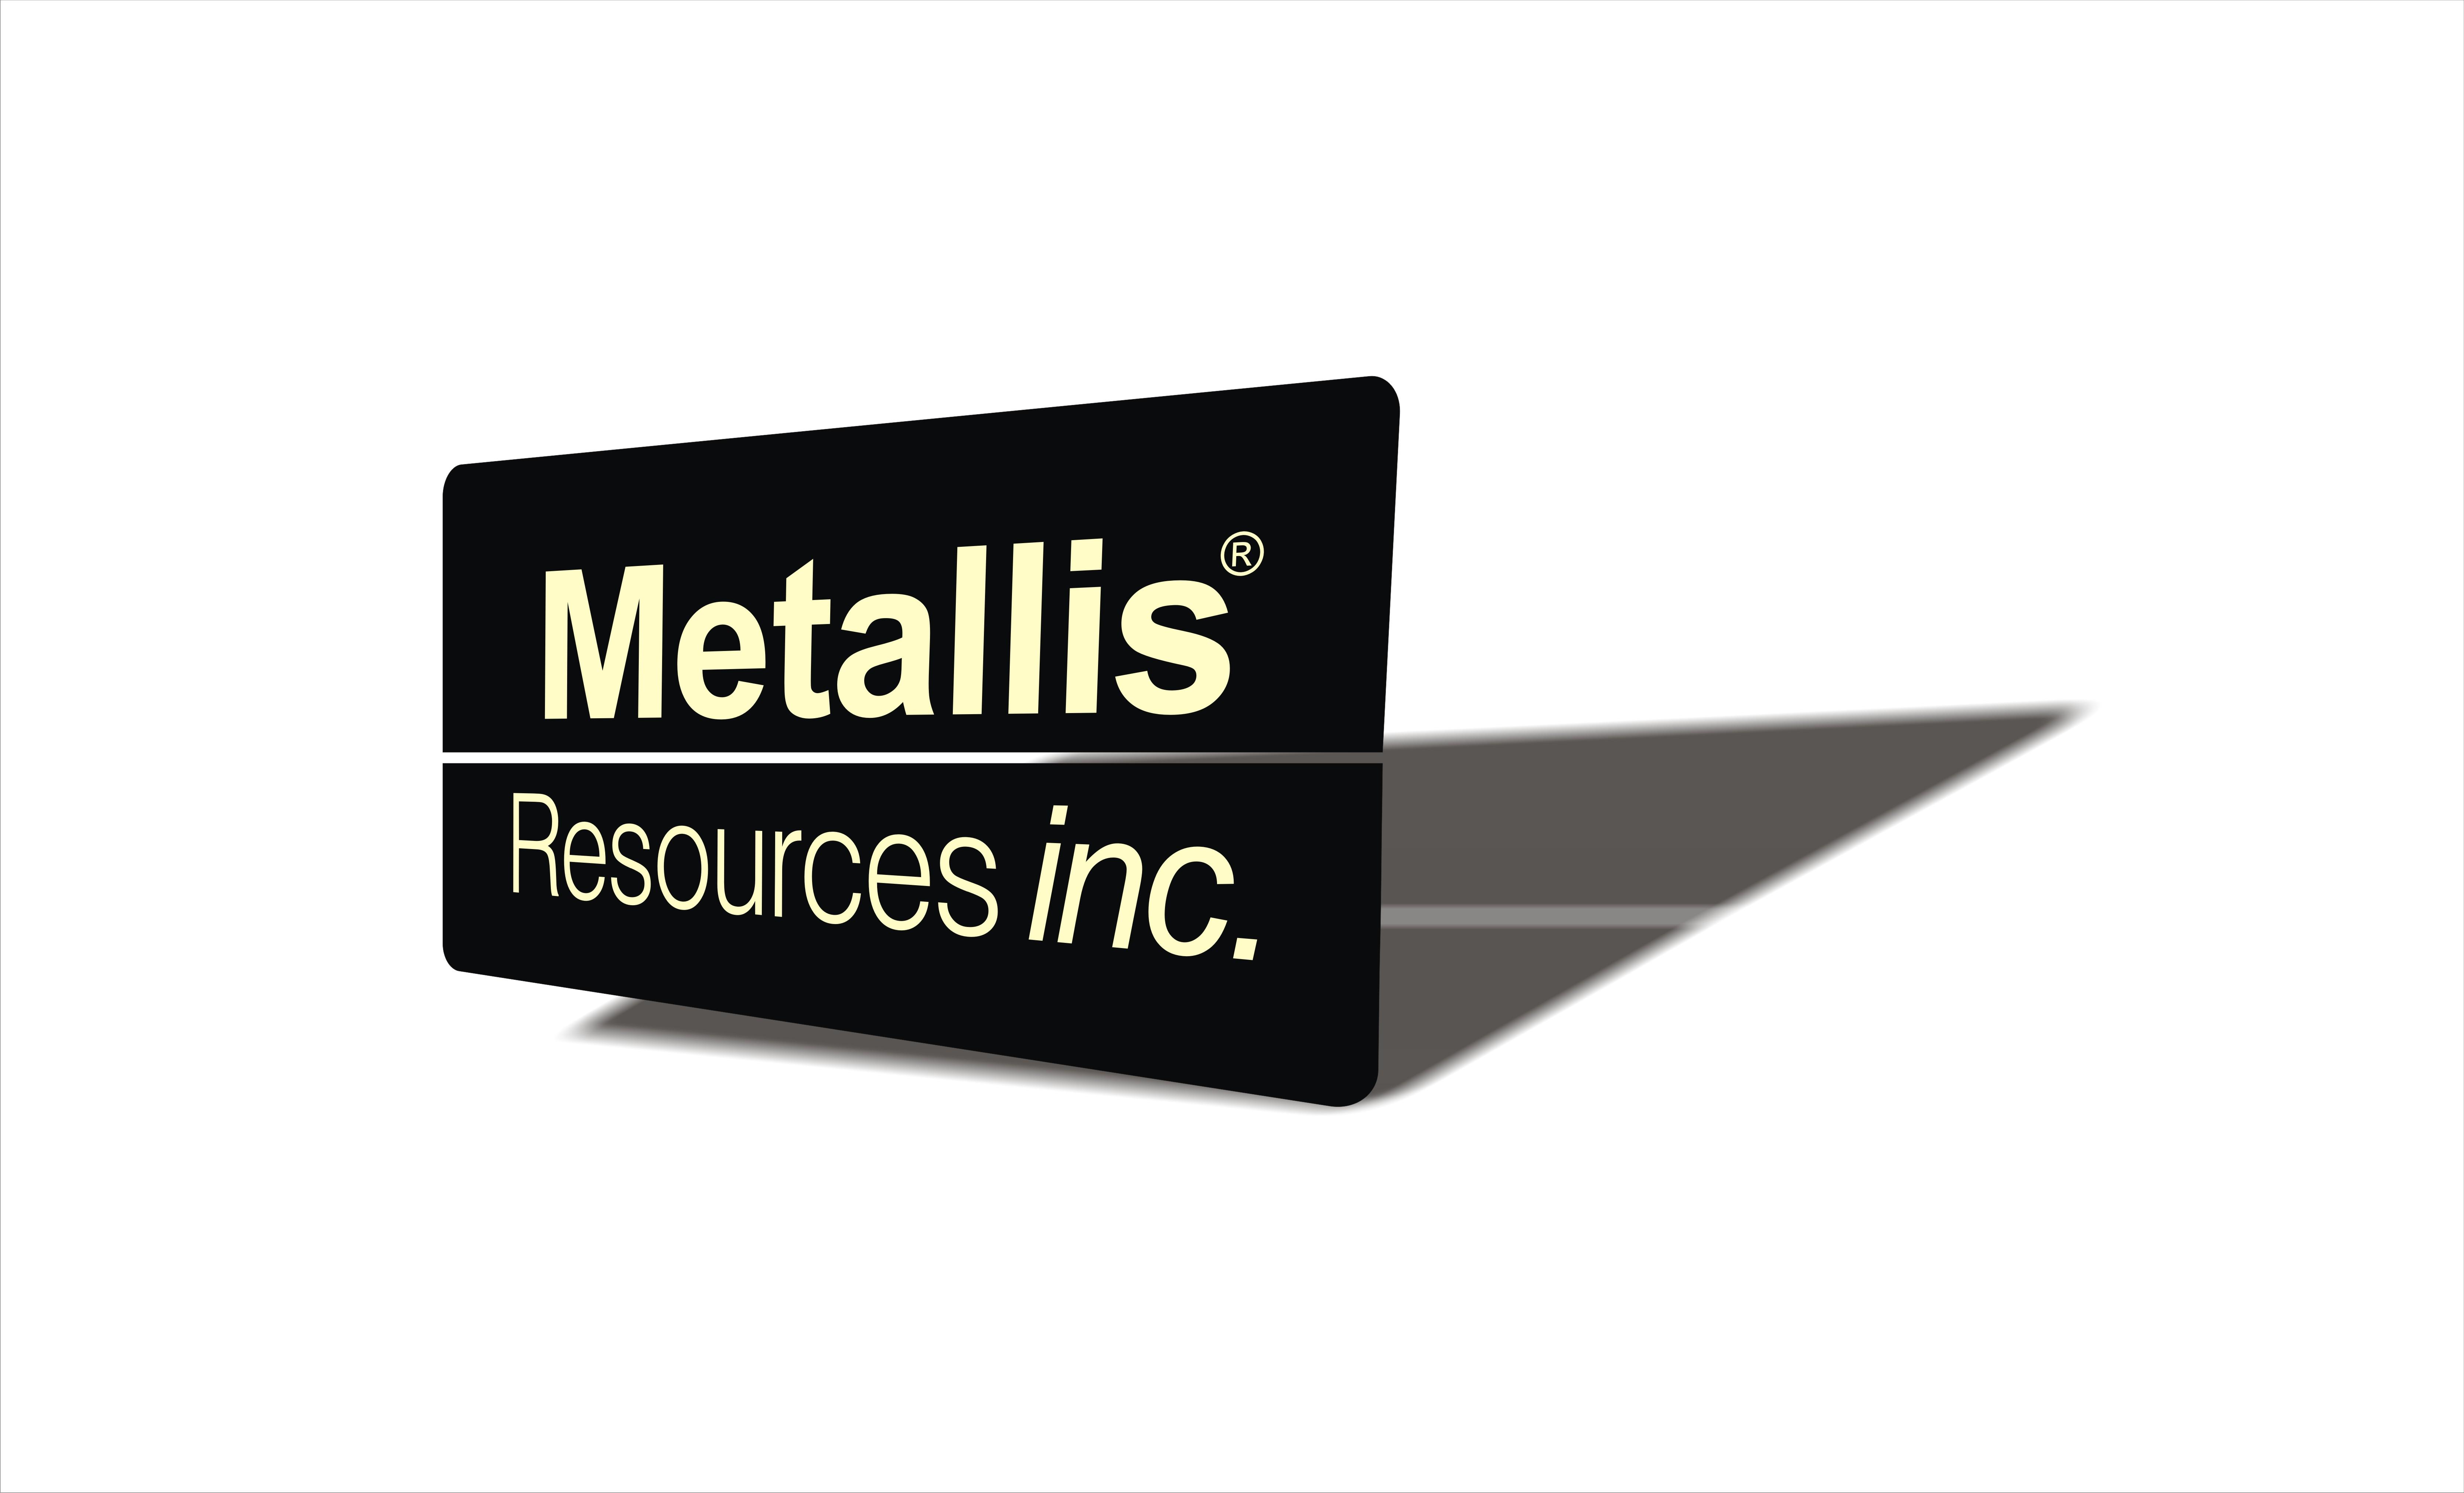 Logo Design by Eic Limber - Entry No. 49 in the Logo Design Contest Metallis Resources Inc Logo Design.